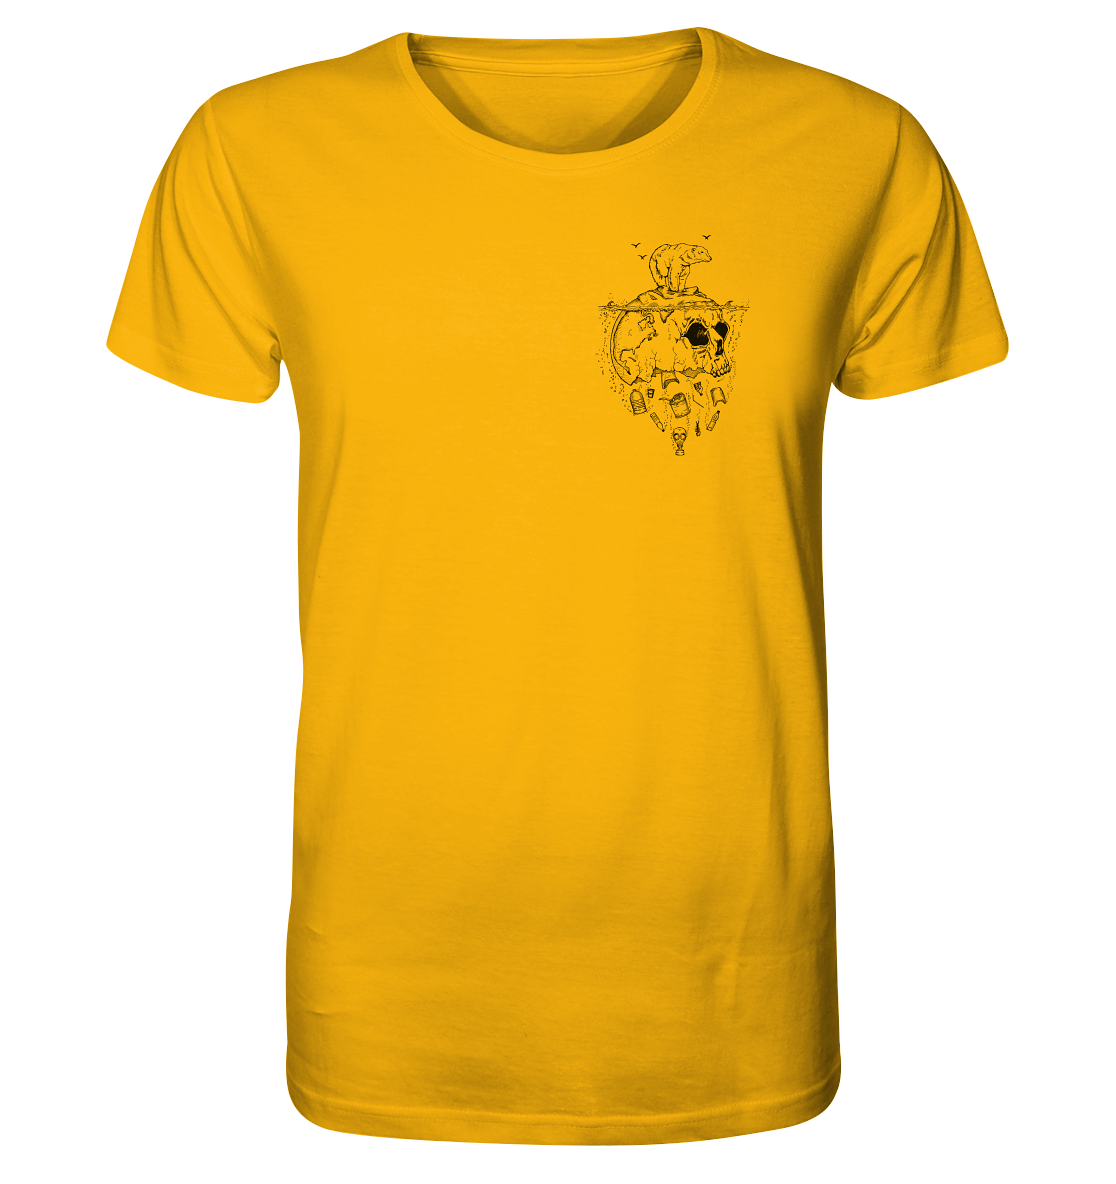 front-organic-shirt-fab40d-1116x-20.png